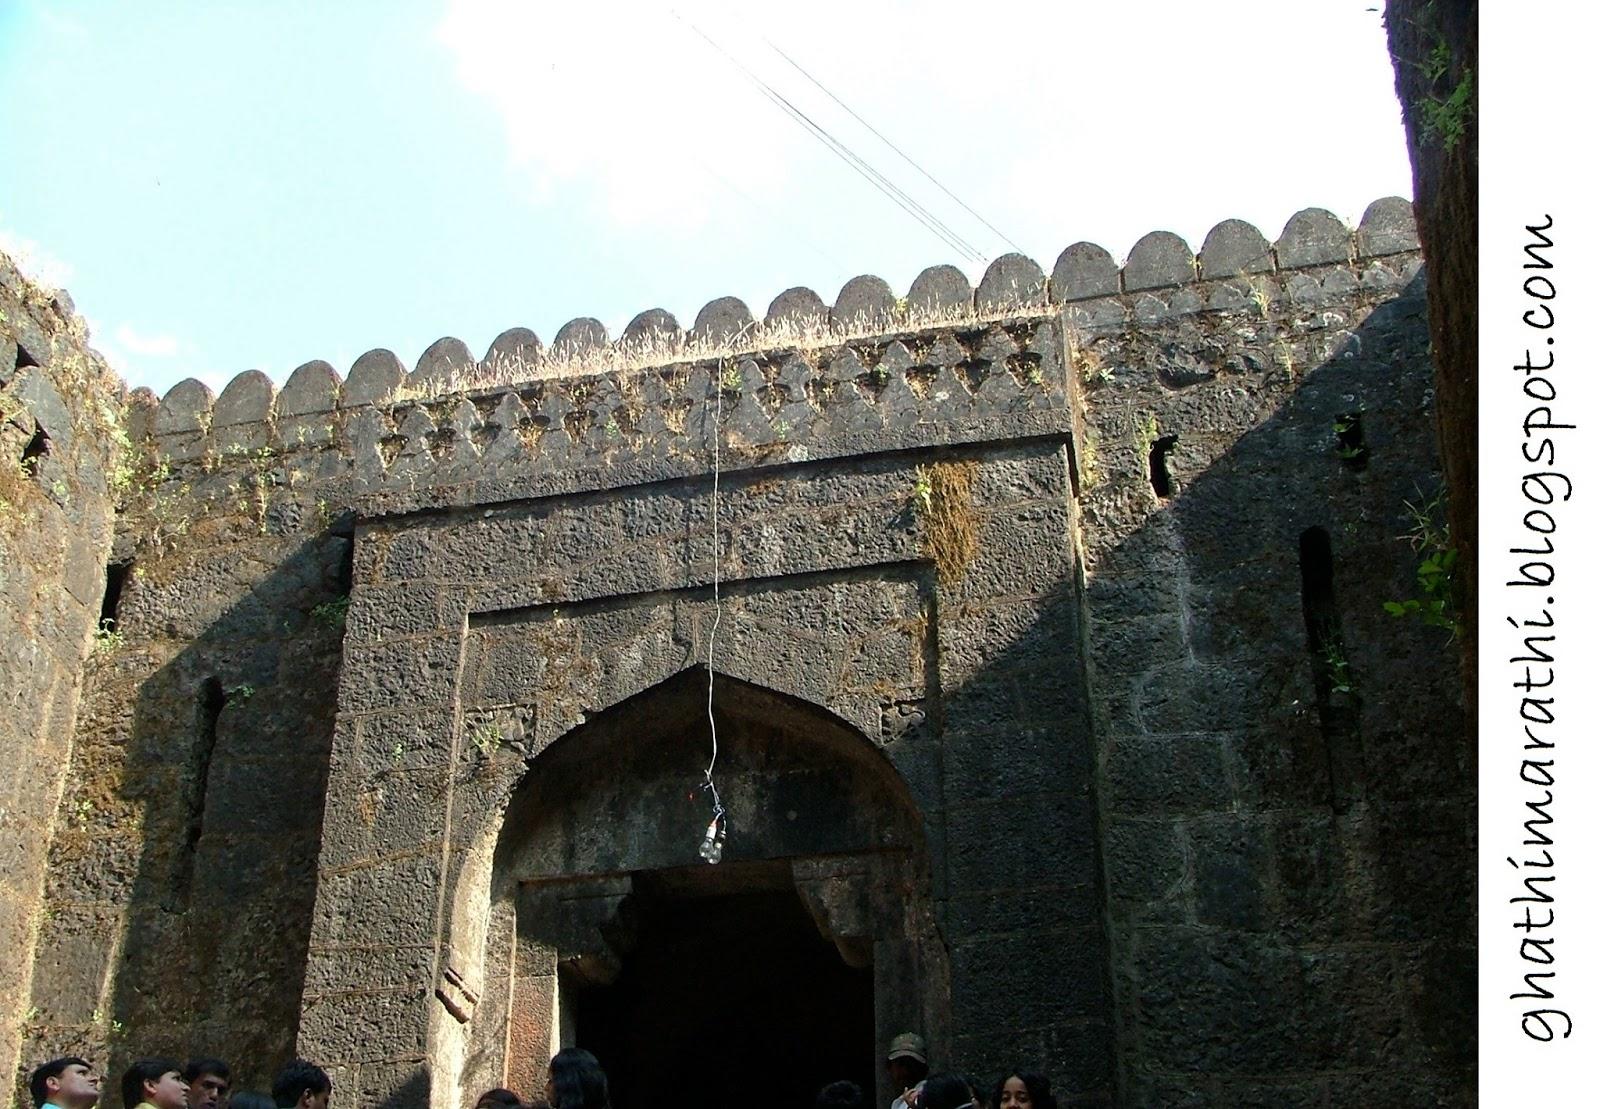 Sankranti Hd Wallpapers Shivaji Maharaj Pratapgad Fort Photo Images Wallpapers